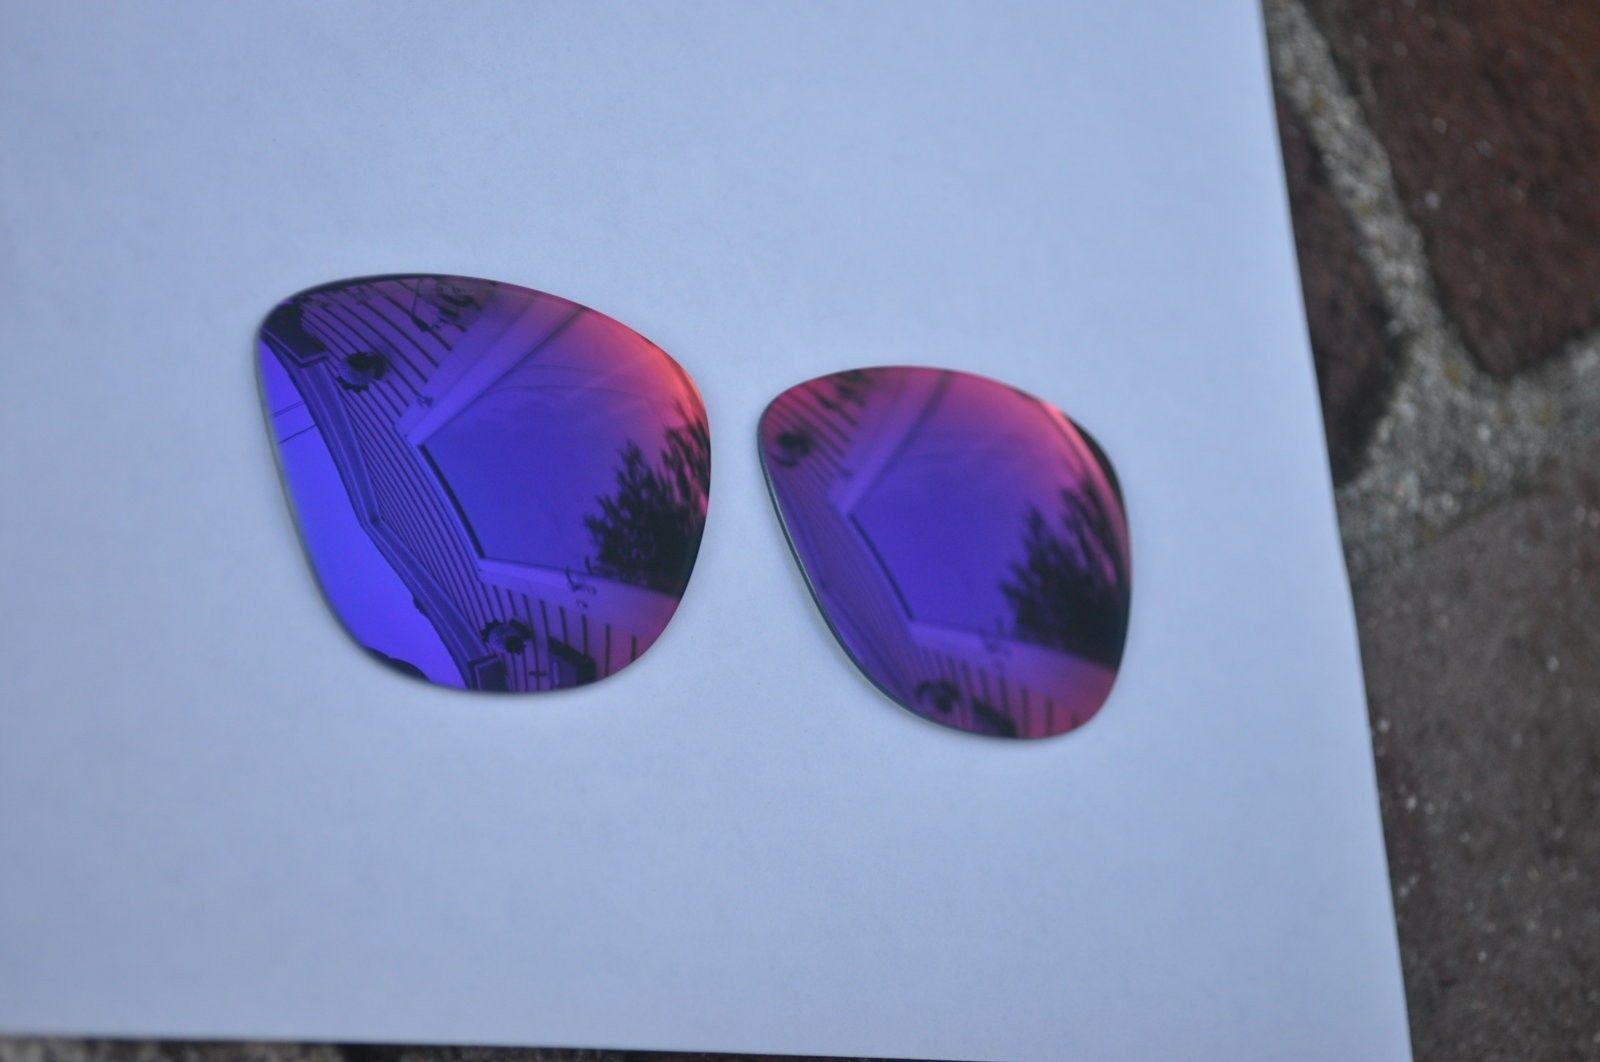 Pos Red Polar Lens and Emerald Lens - DSC_0300.JPG